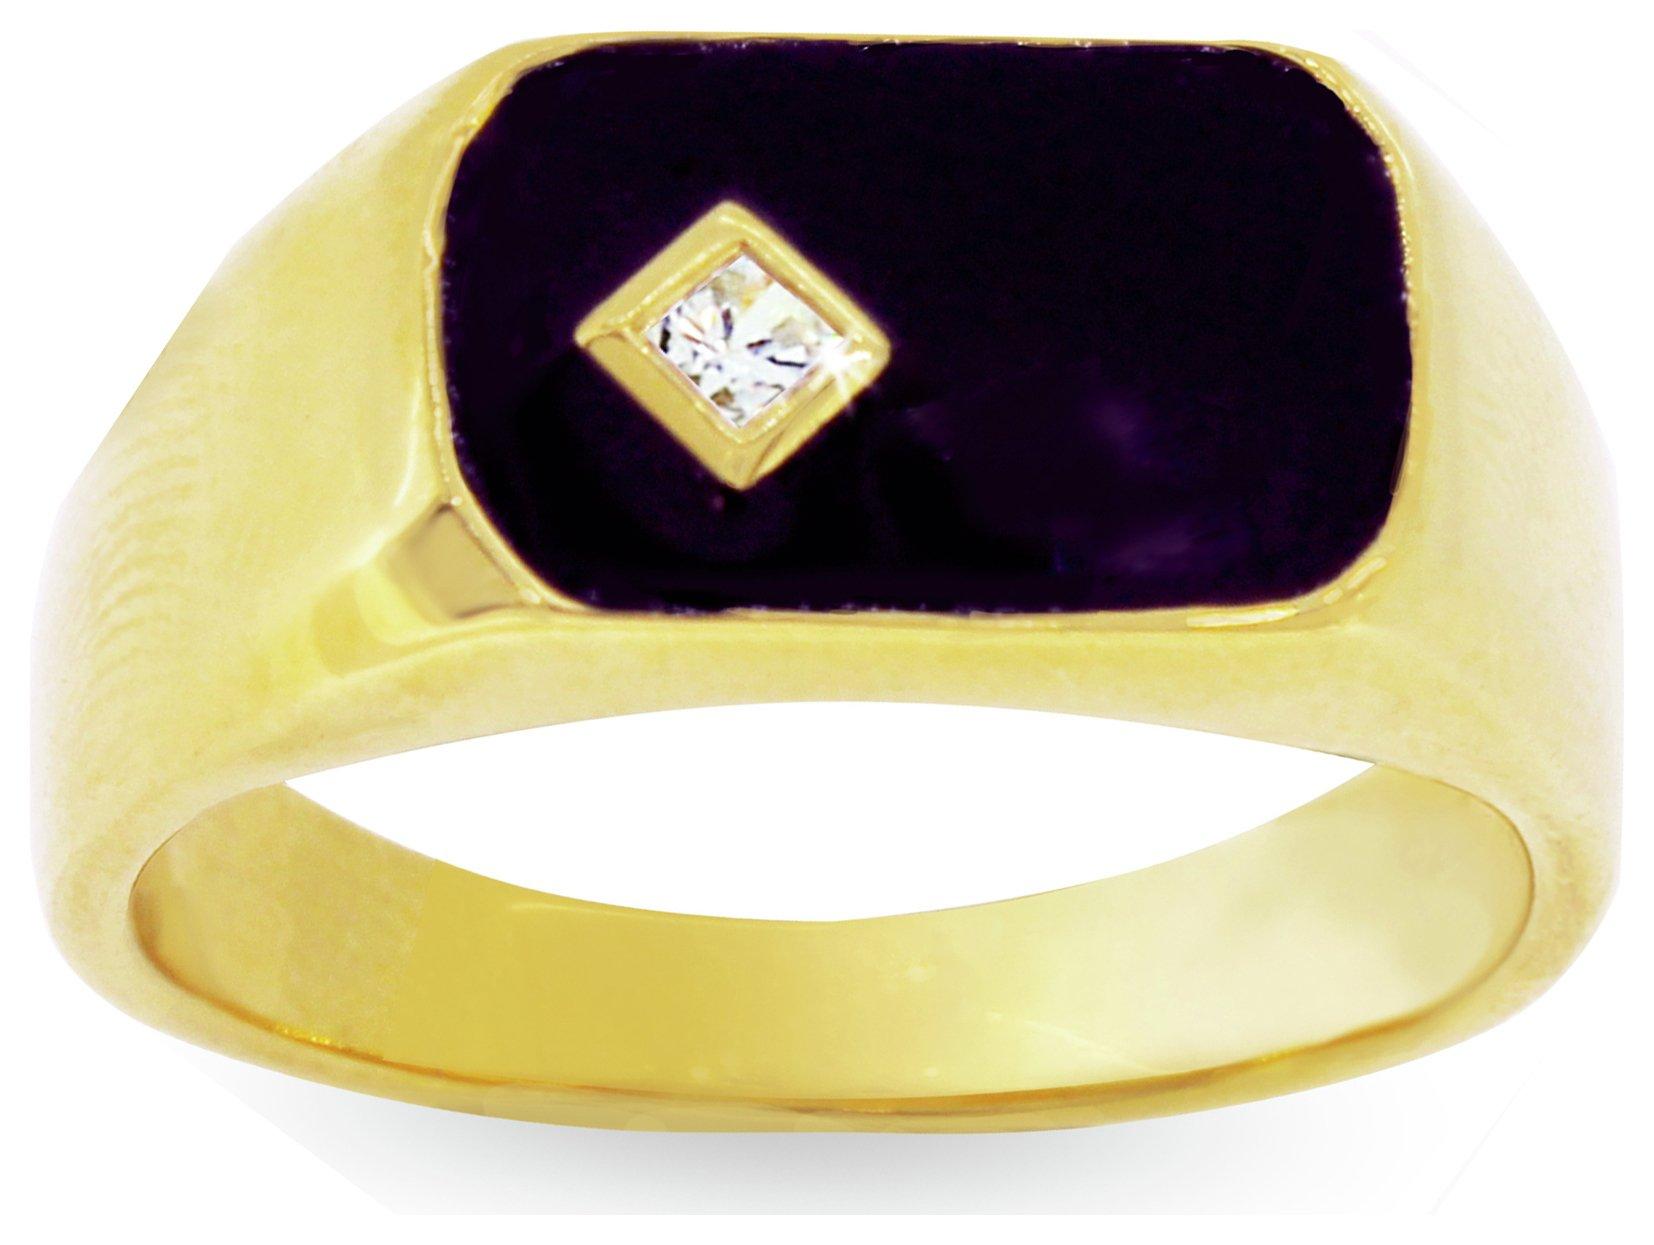 Image of Revere Men's 9ct Gold Plated Silver Black Enamel CZ Ring